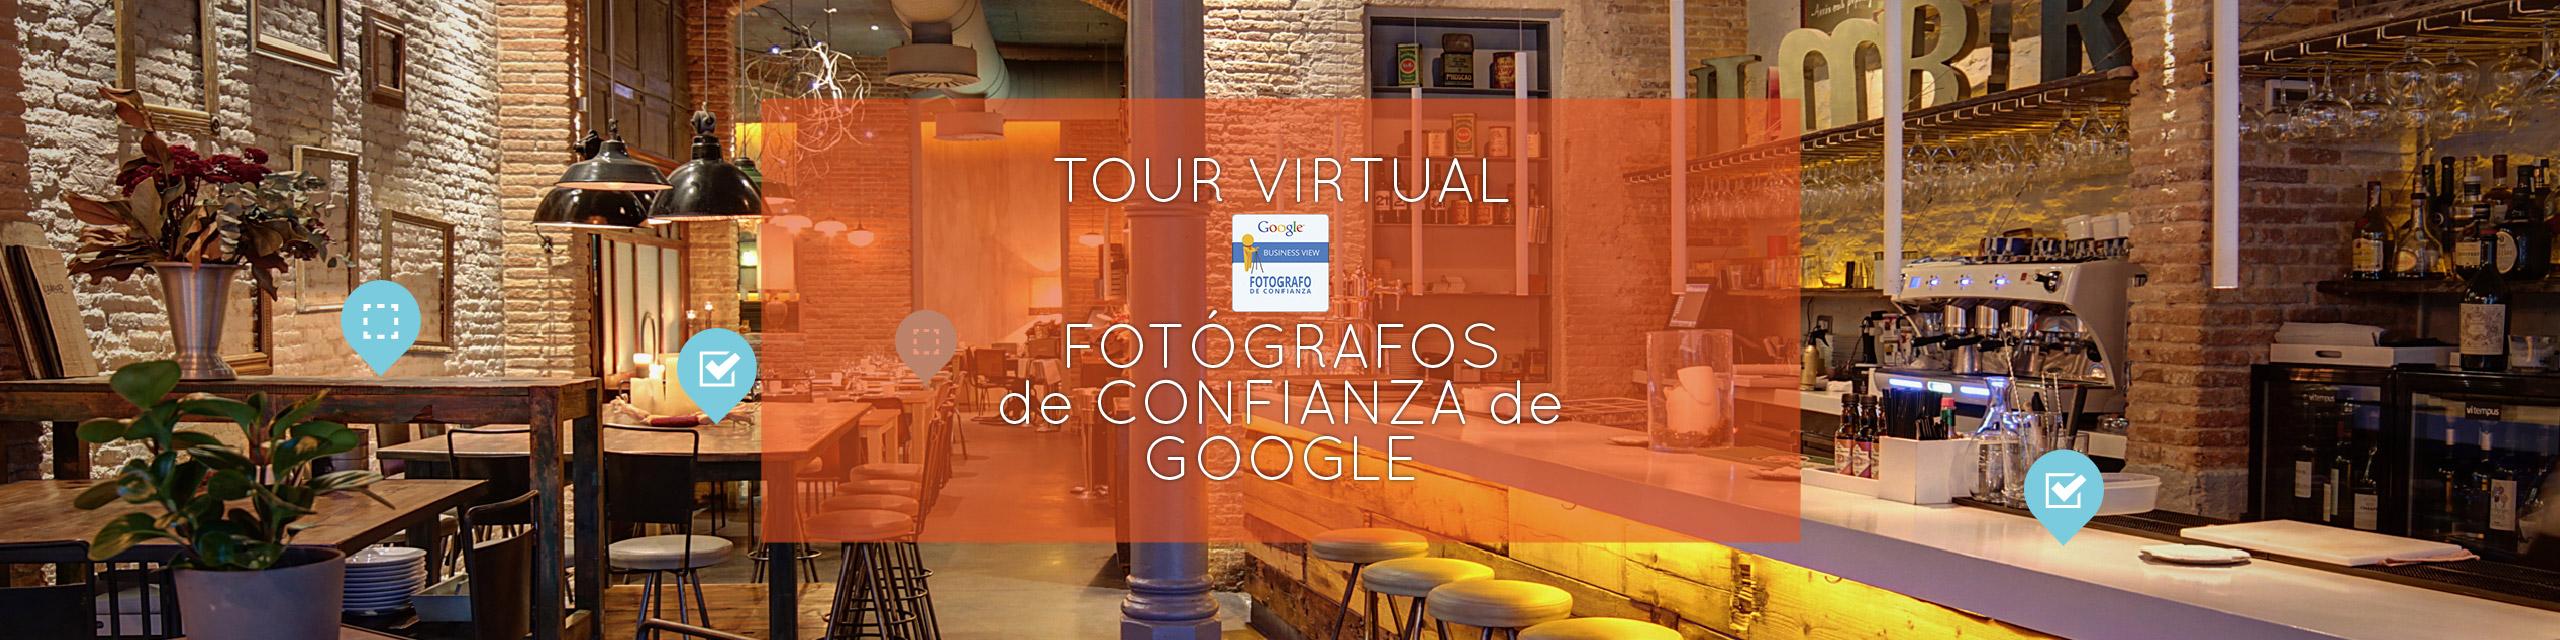 tour-virtual google